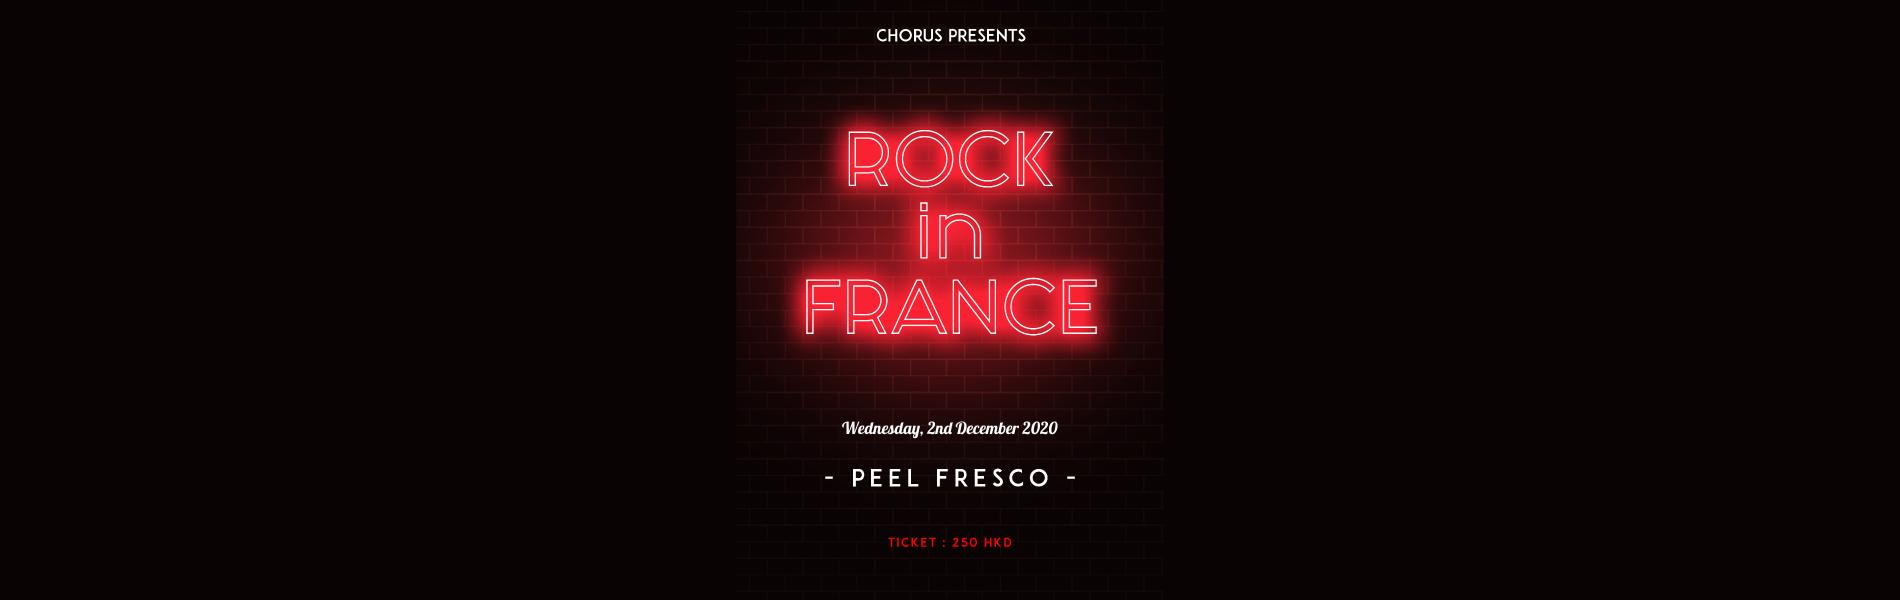 ROCK IN FRANCE